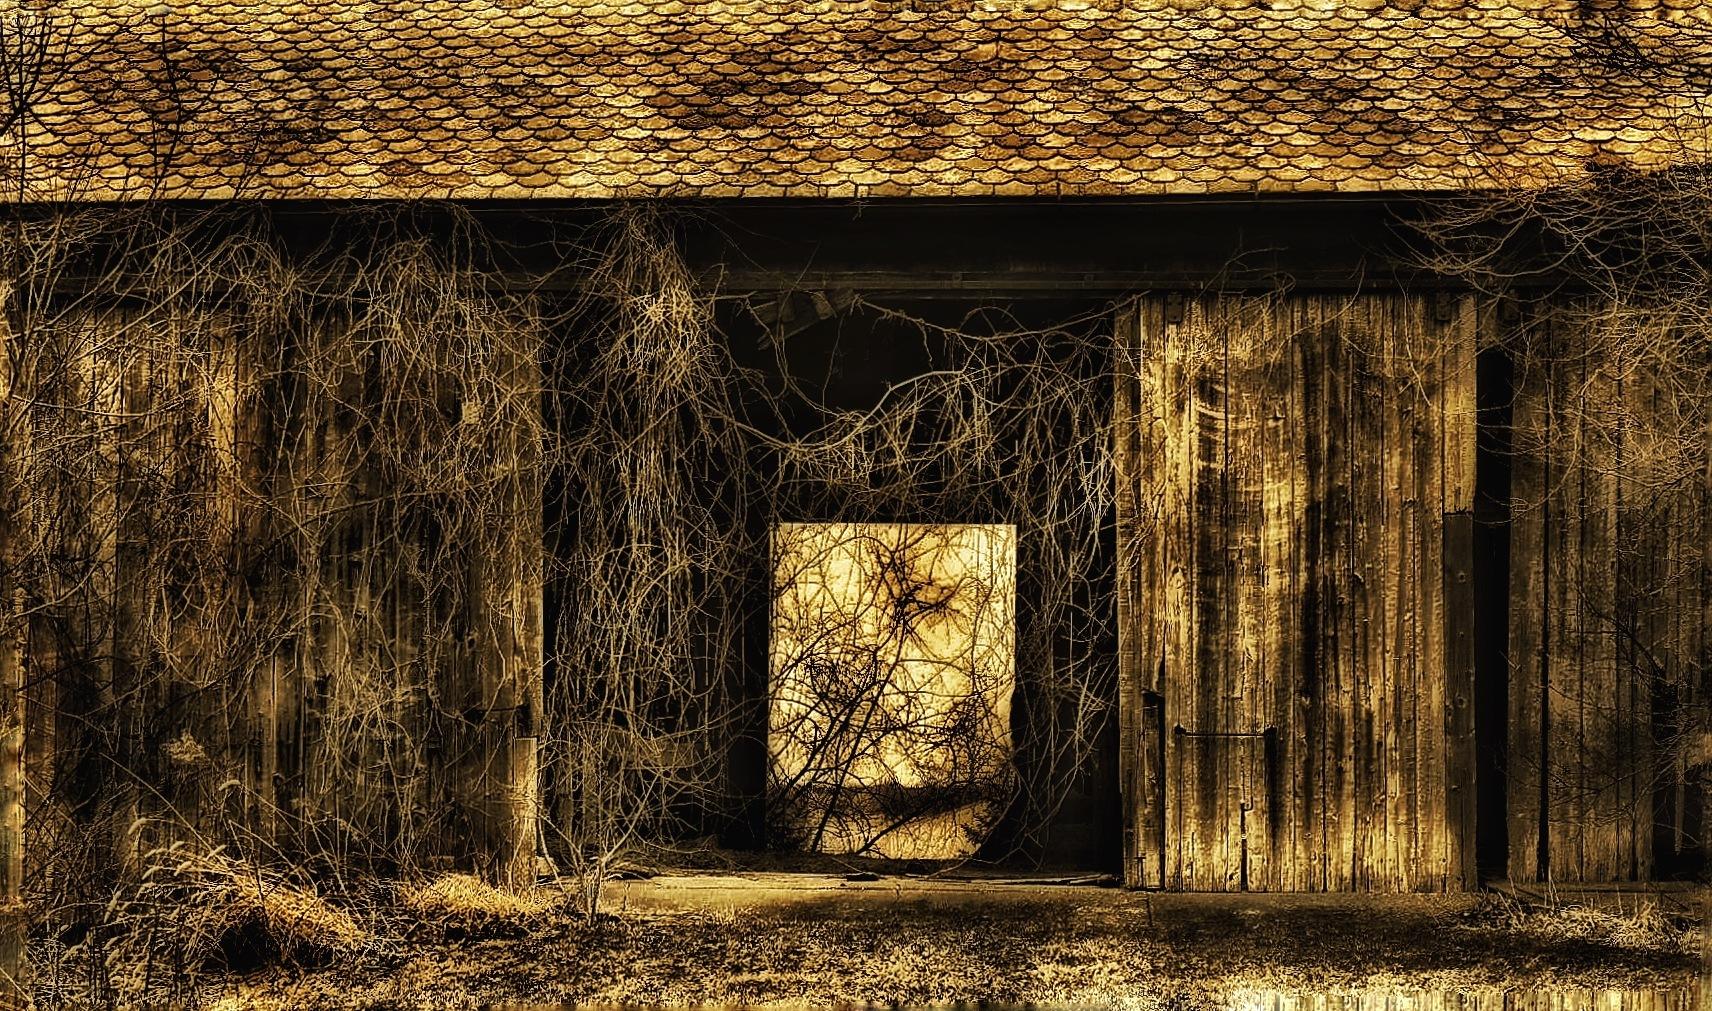 Abandoned Ohio Barn by Walter Novak